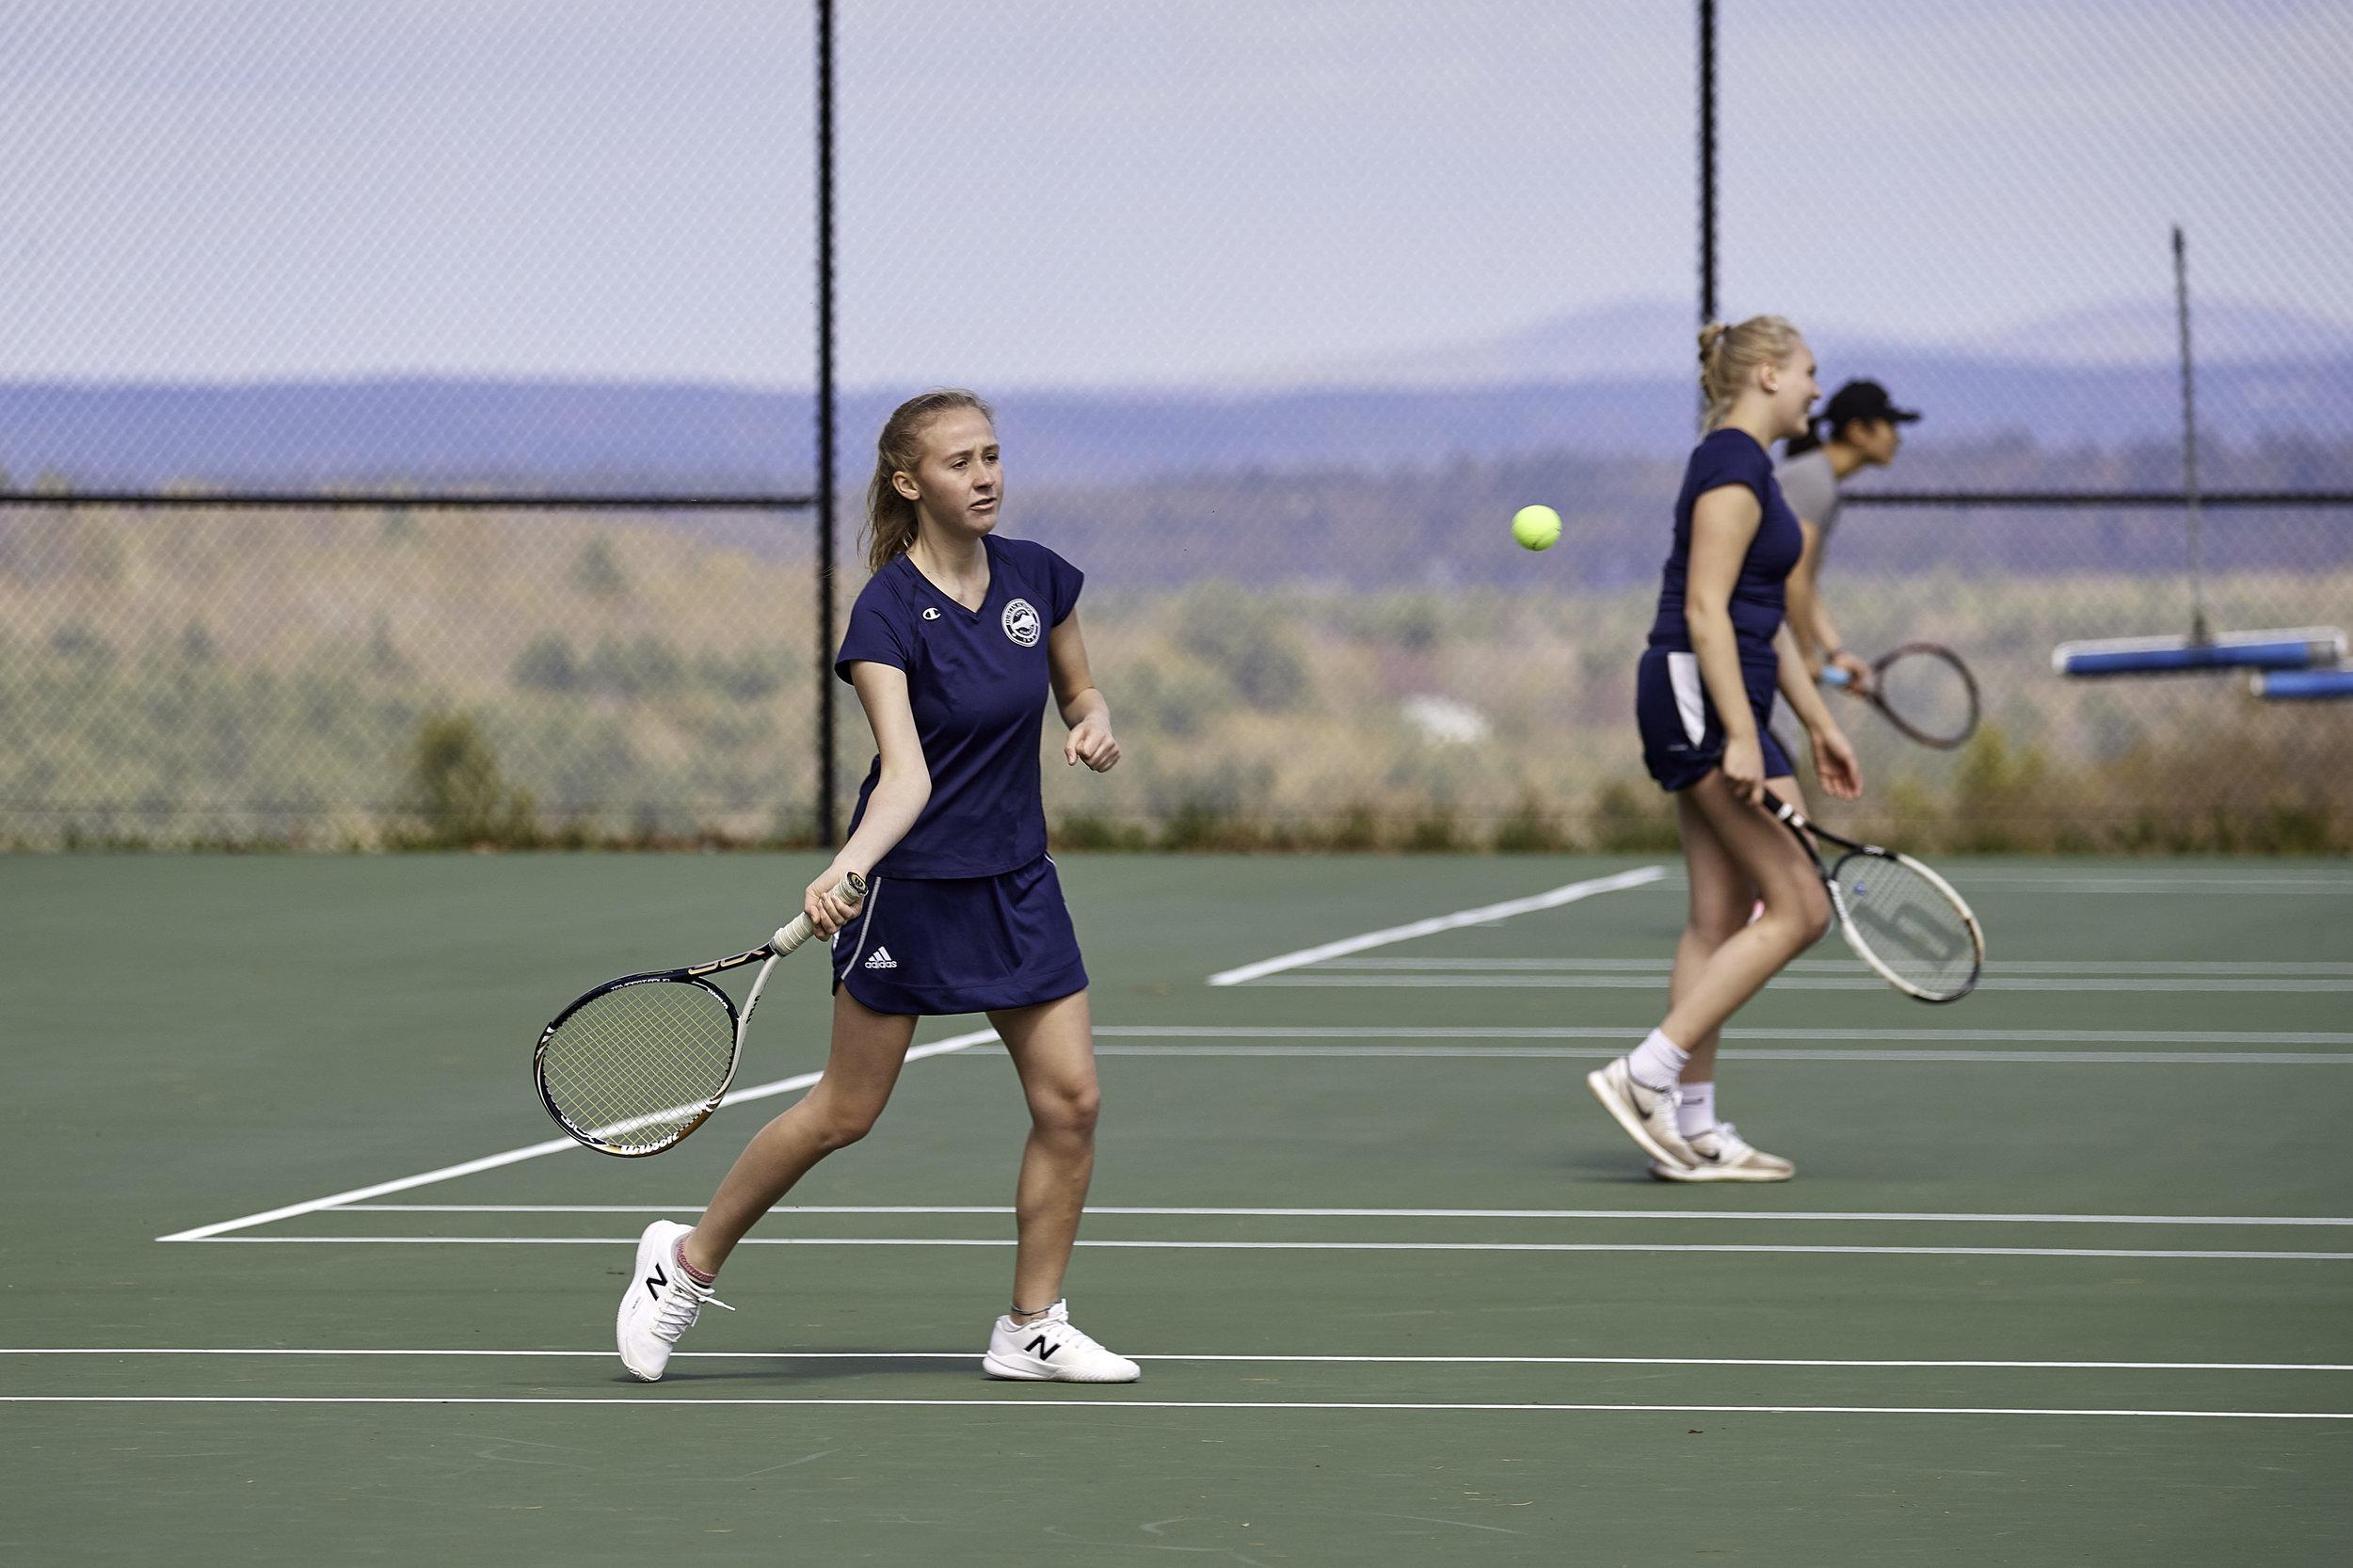 Girls Tennis vs. Winchendon School - May 15, 2019 -195196.jpg